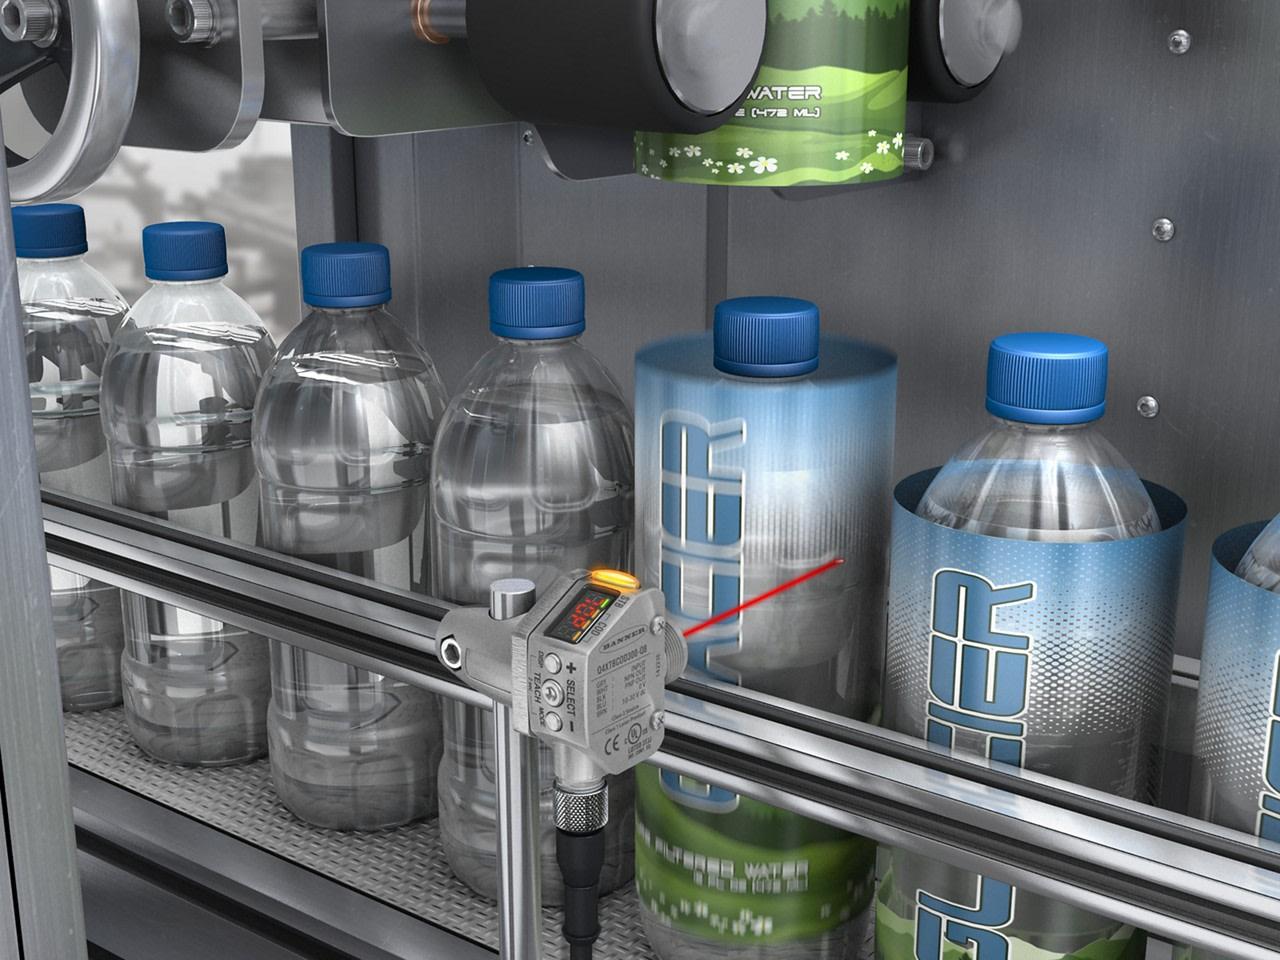 Detecting Clear Glass Bottles to Trigger Shrink Sleeve Labeler